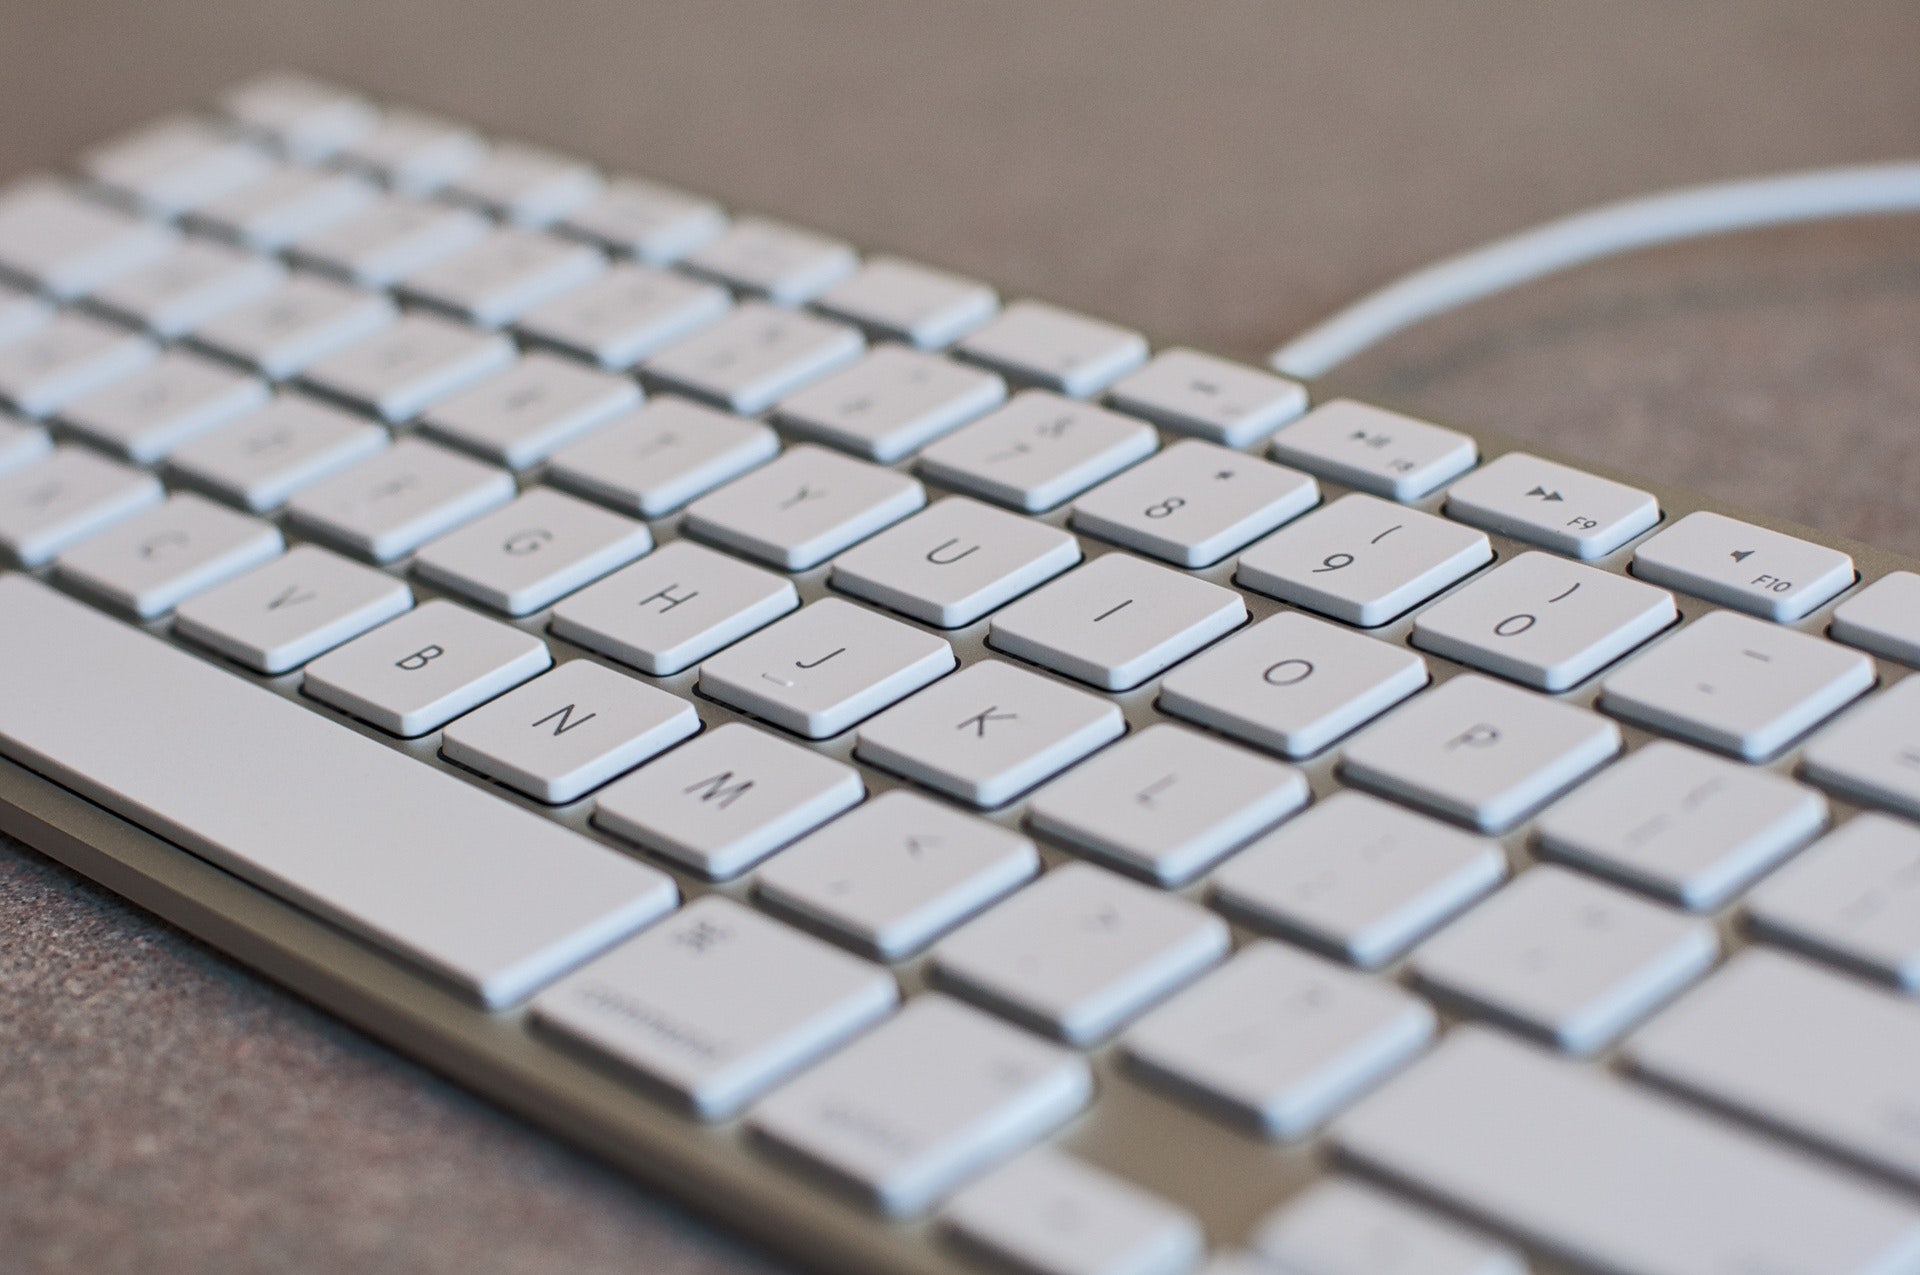 White computer keyboard photo